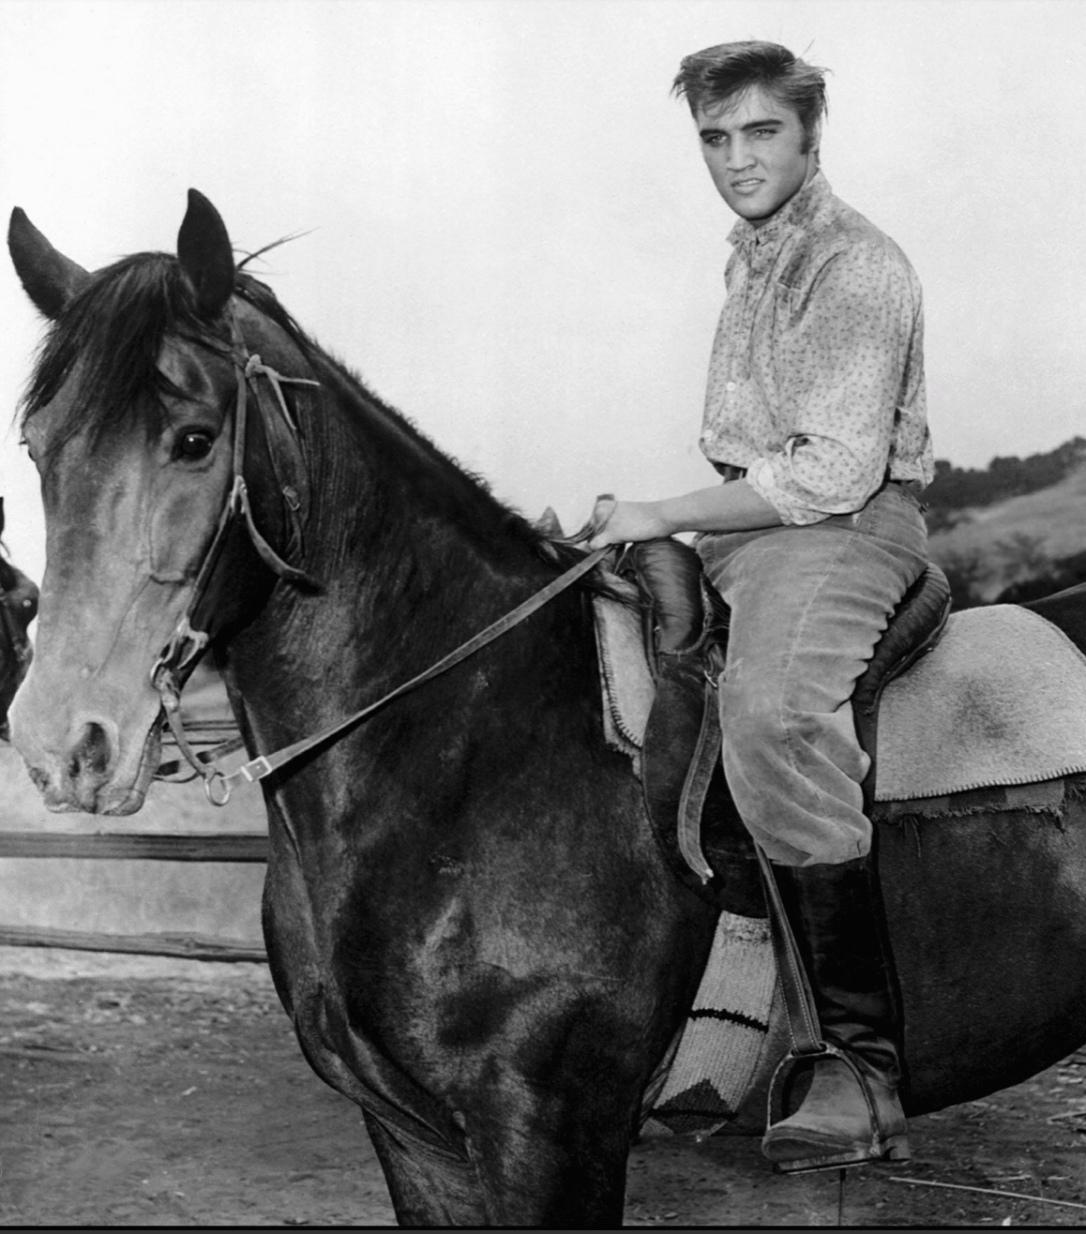 Elvis horse riding